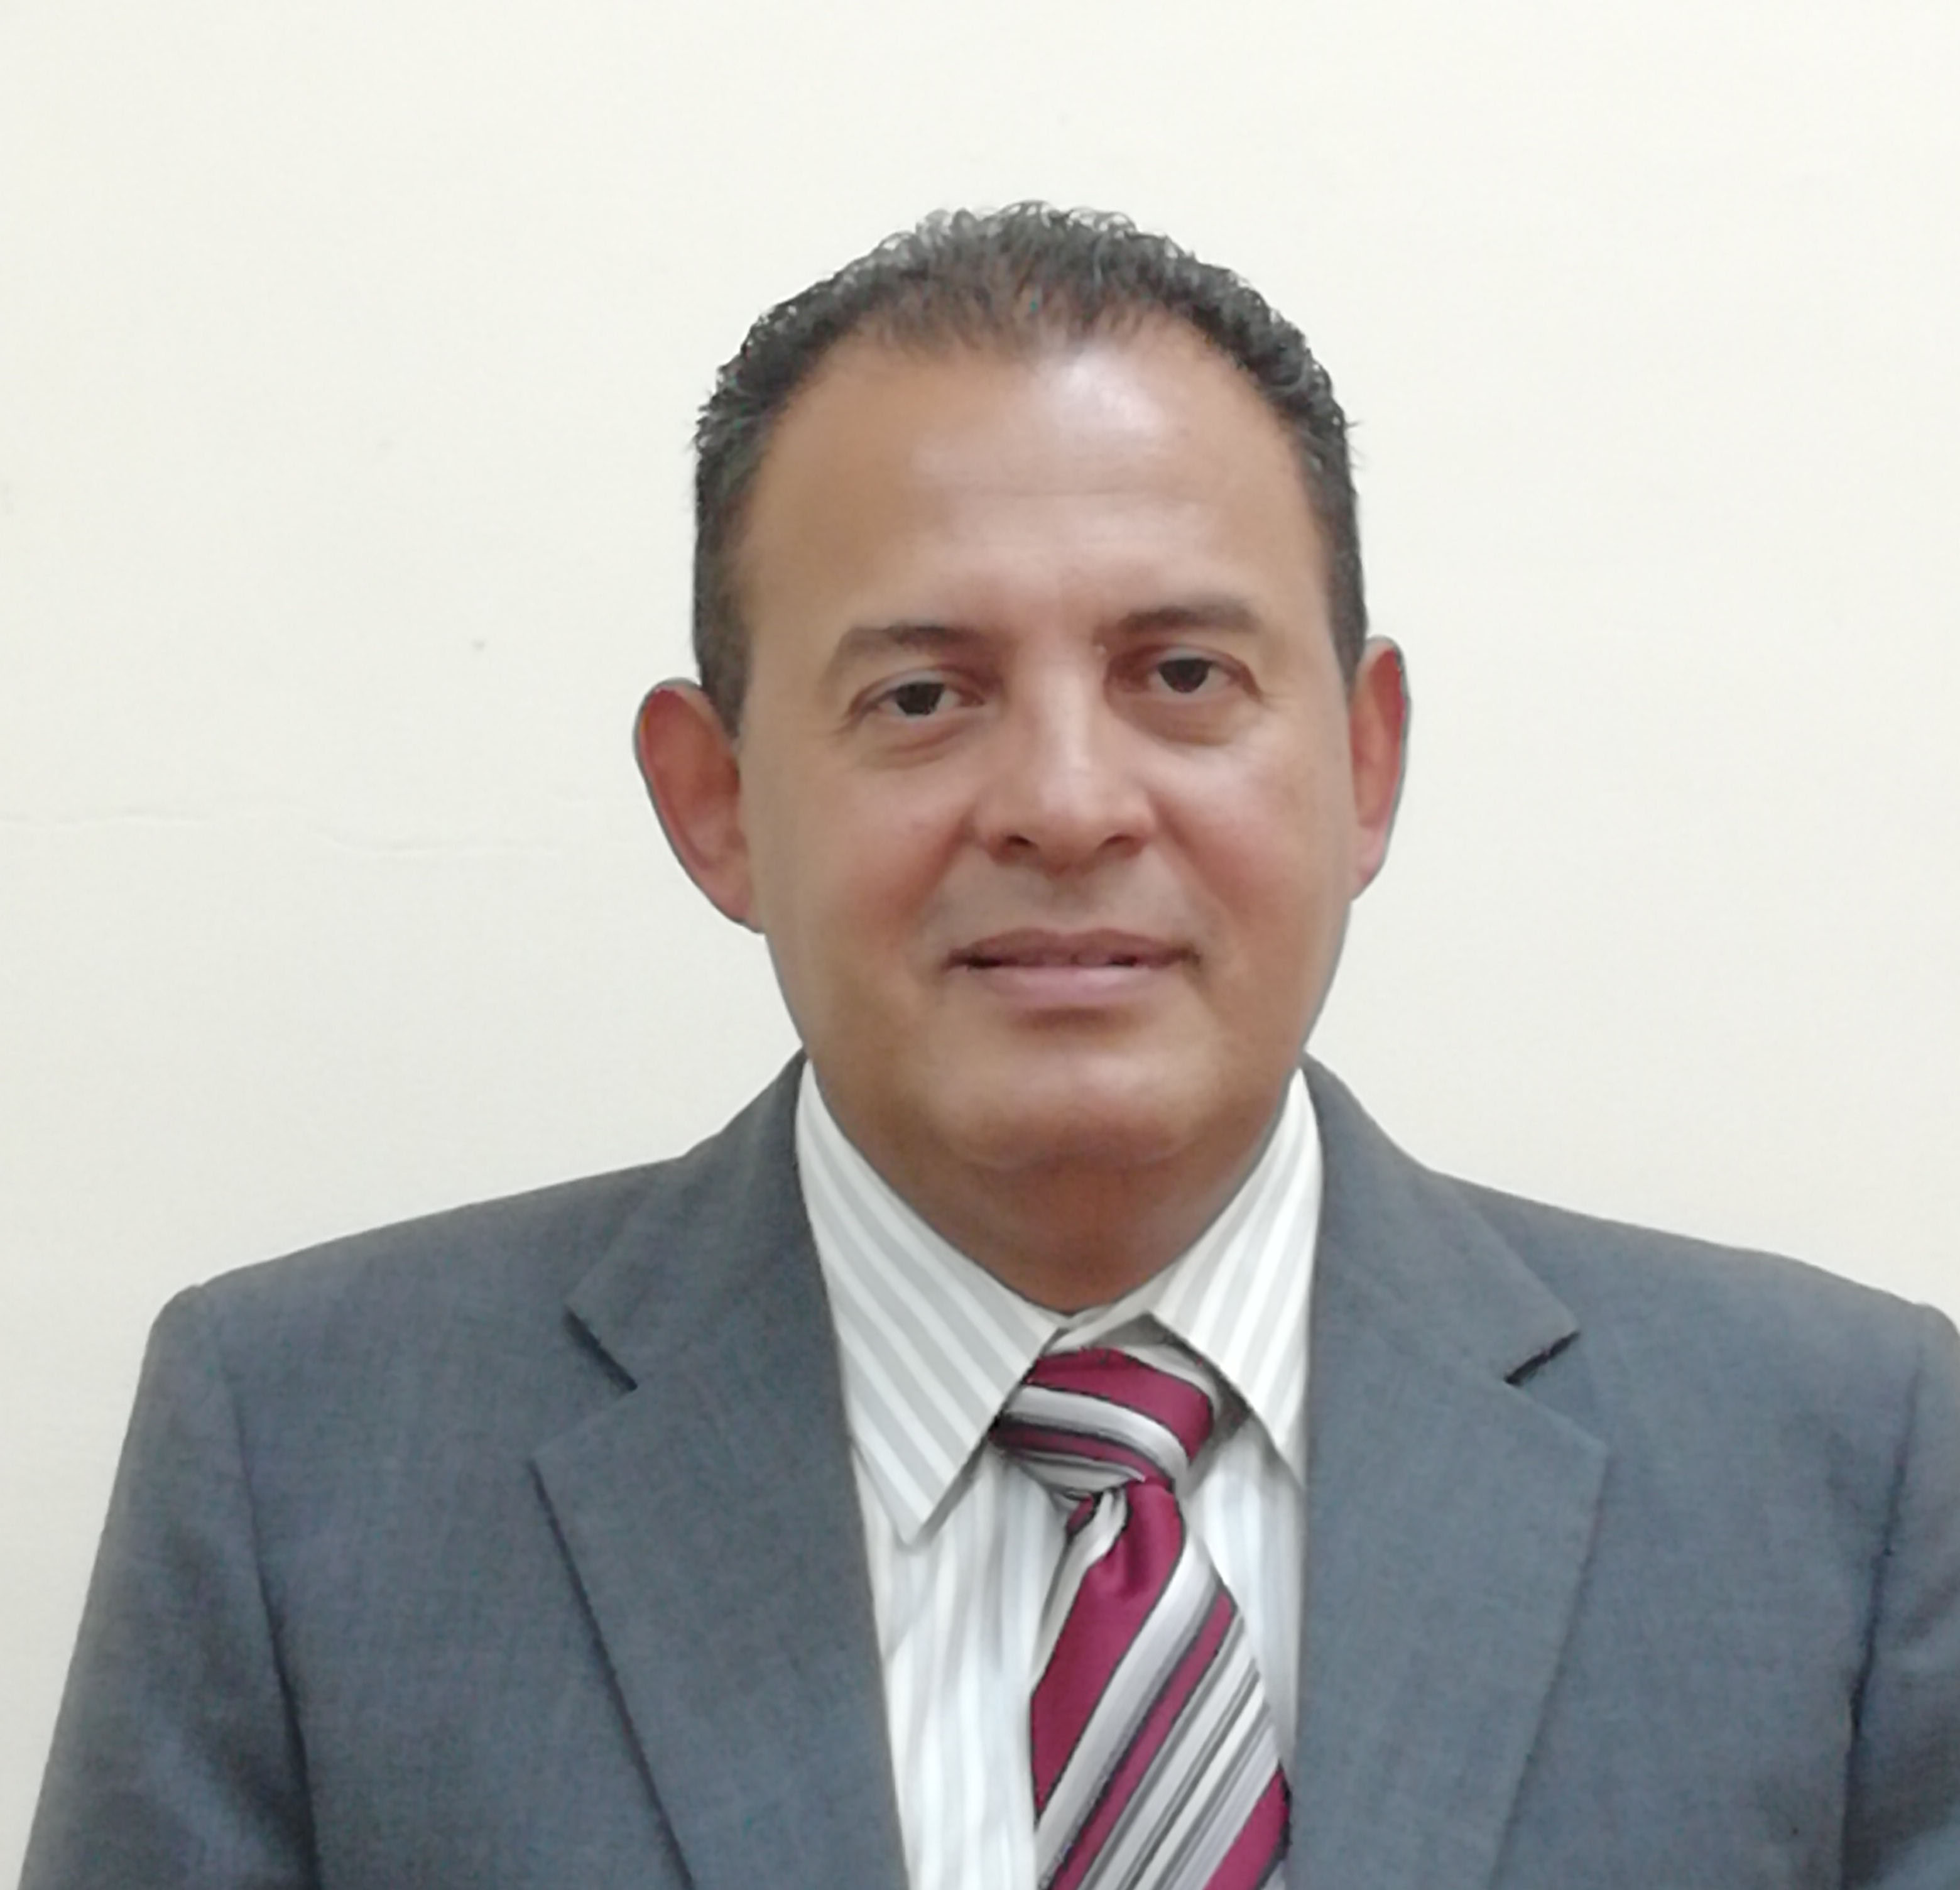 José Armando López Baltodano